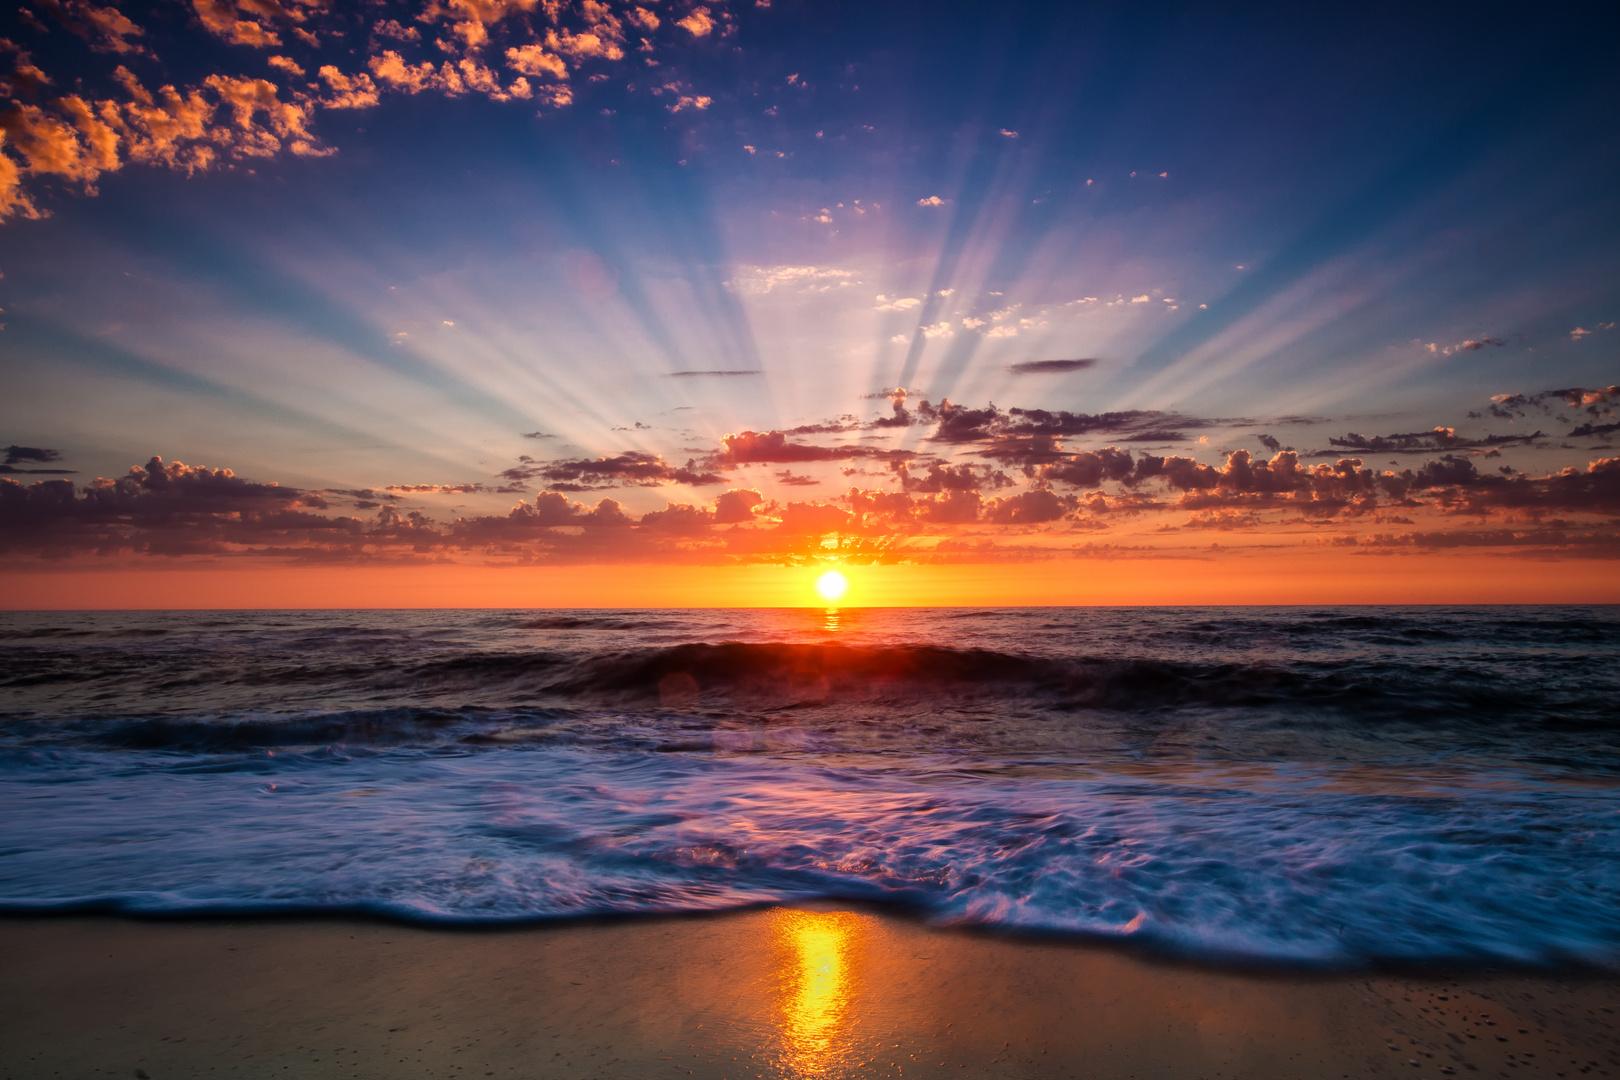 Sonnenuntergang in Mira Portugal